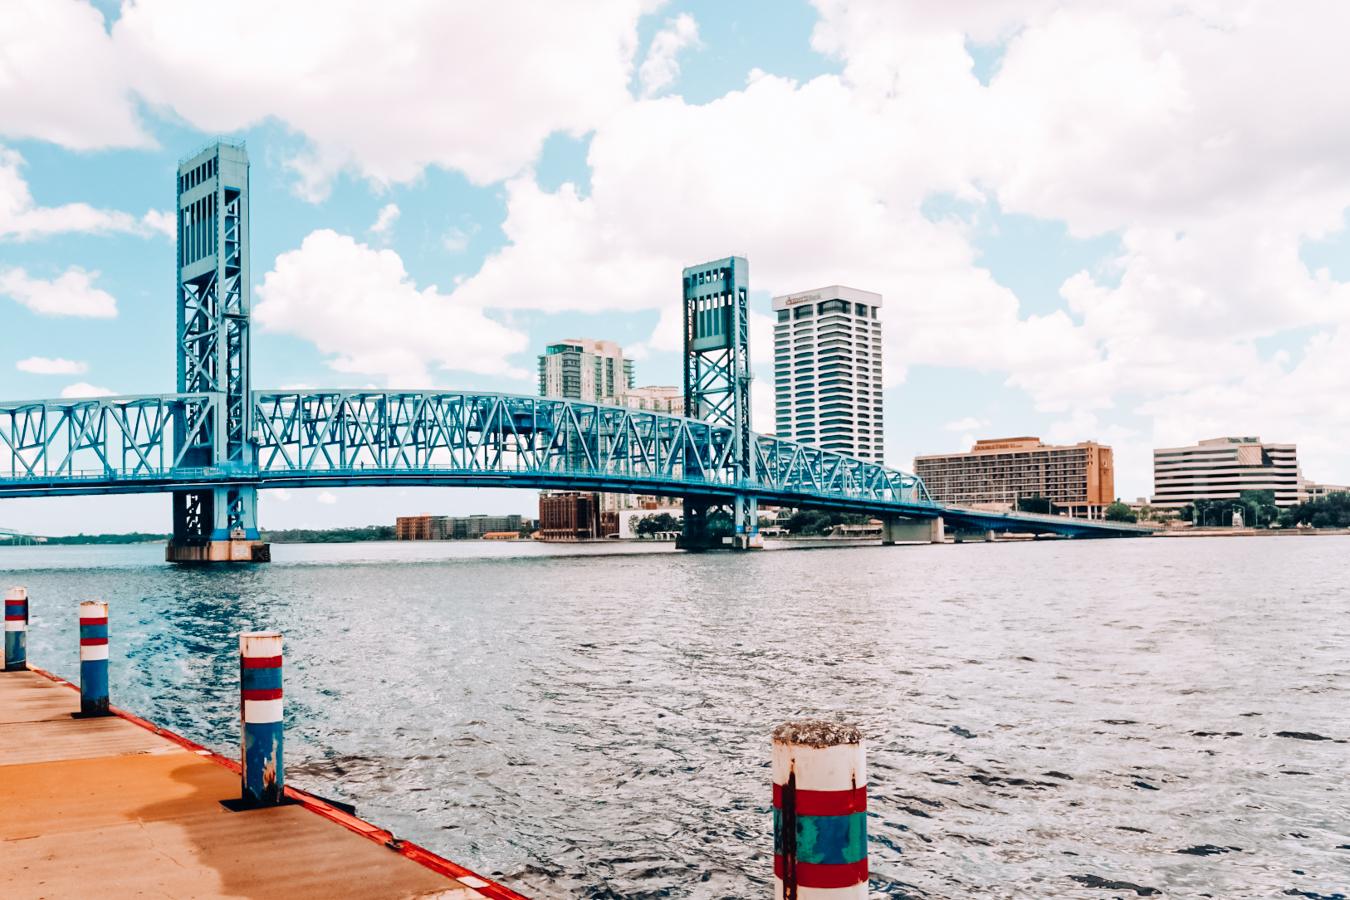 Bridge, water, and buildings